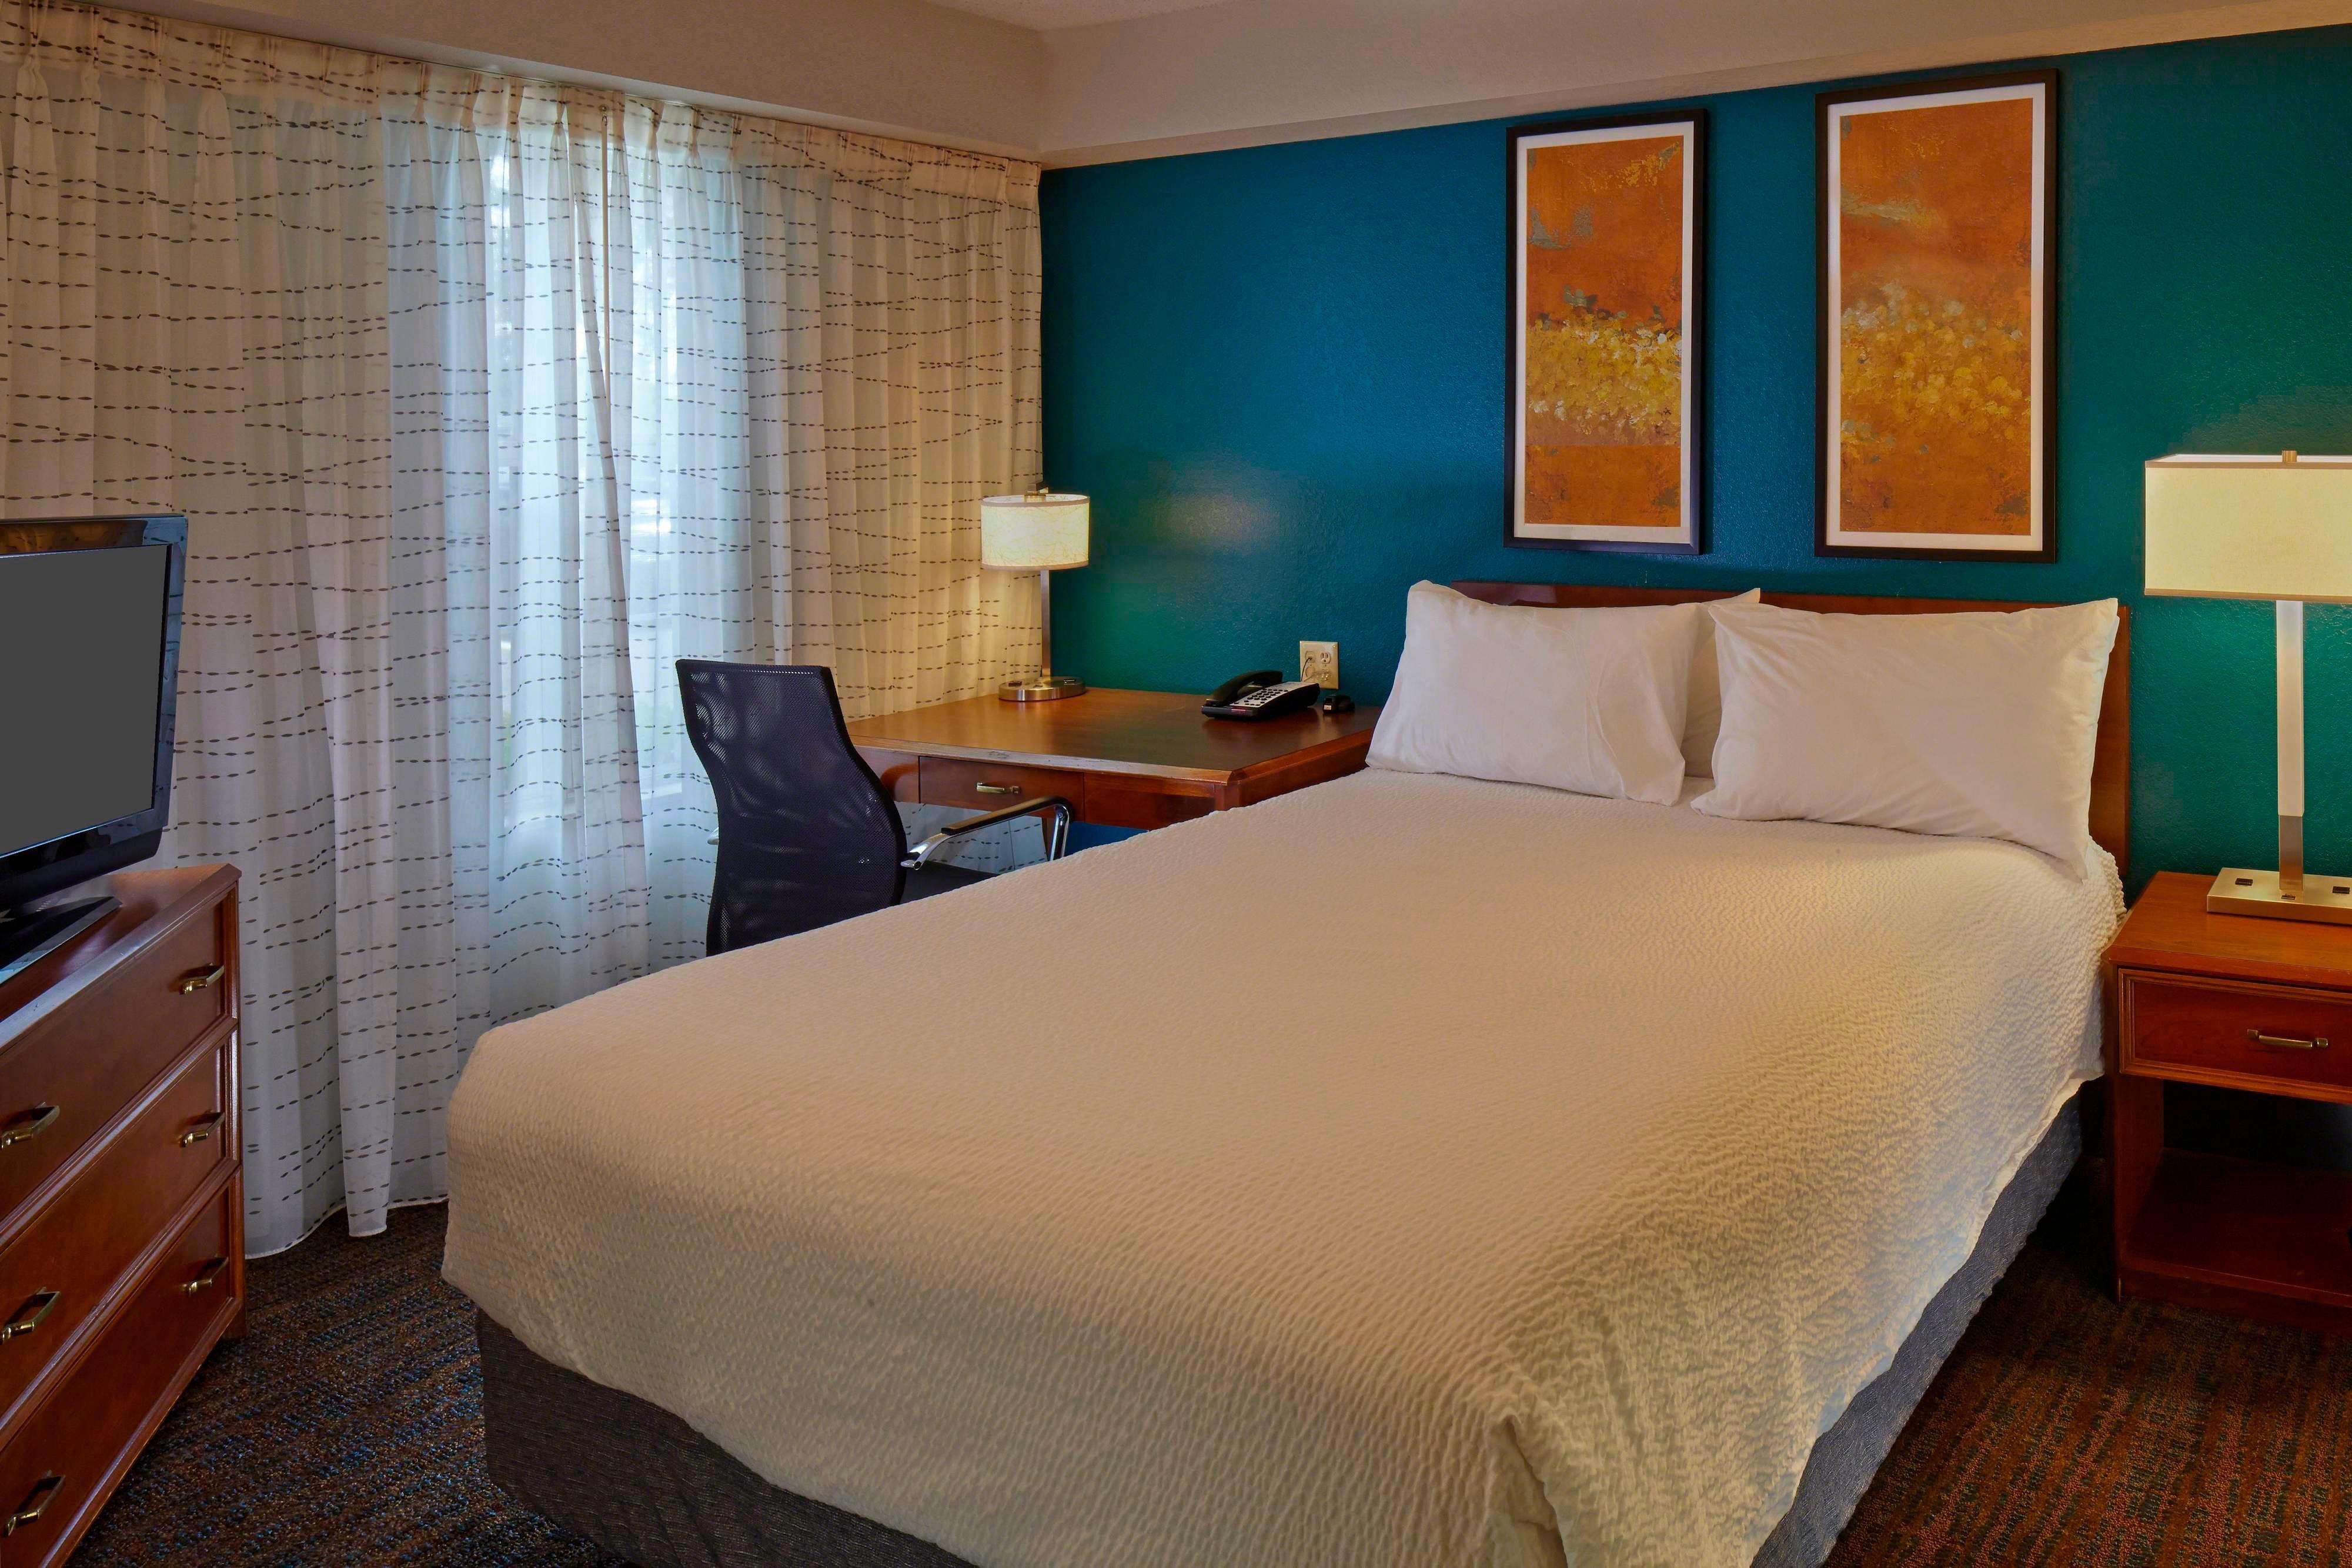 Residence Inn Orlando East Ucf Area Hotel Amenities Hotel Room Highlights